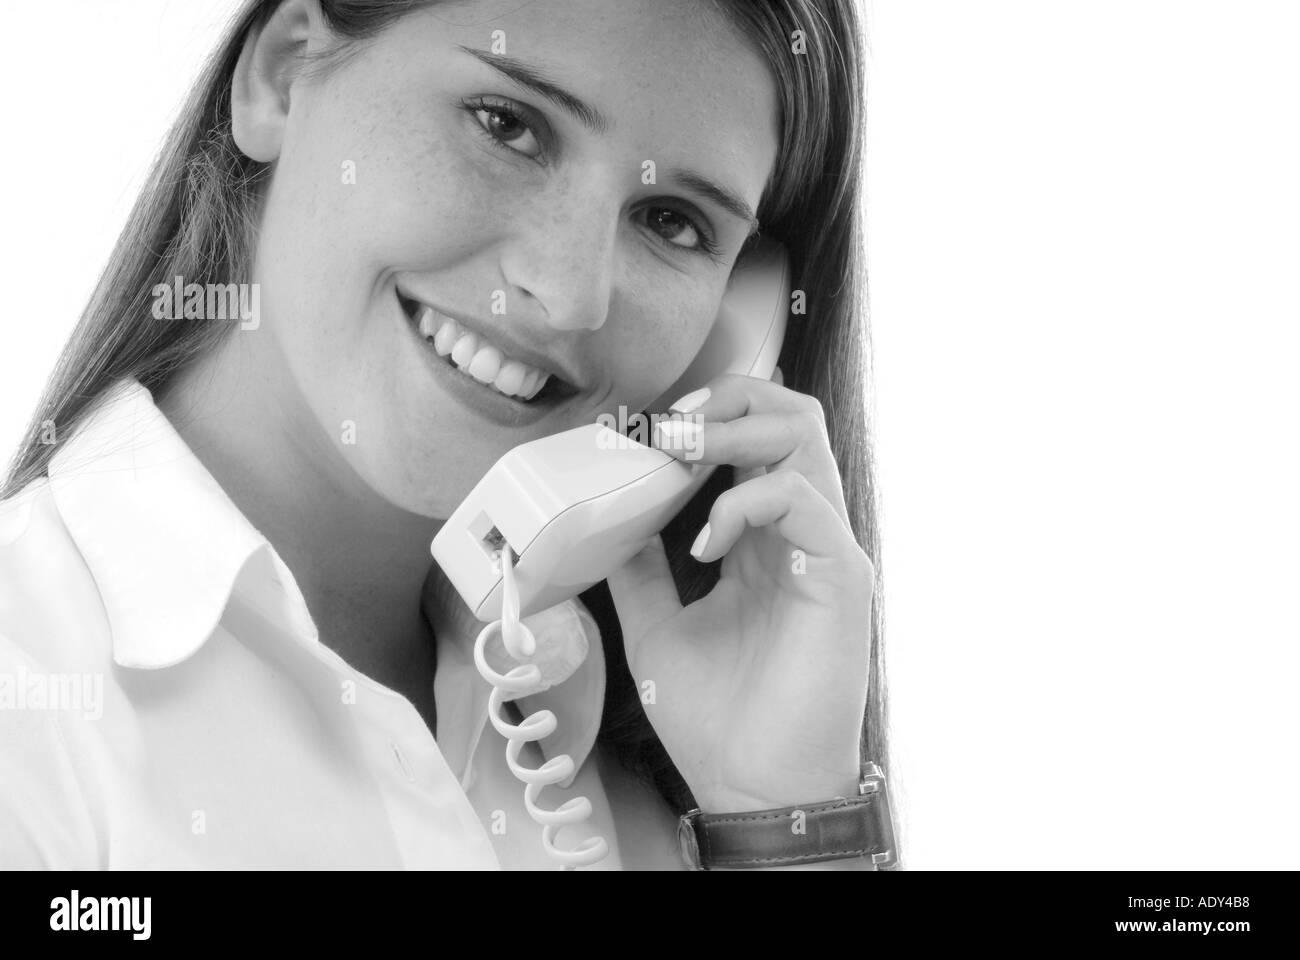 Communication woman women white caucasian cellfones cellfone phone phones telephones telephone phone mobile phones mobile mobile - Stock Image